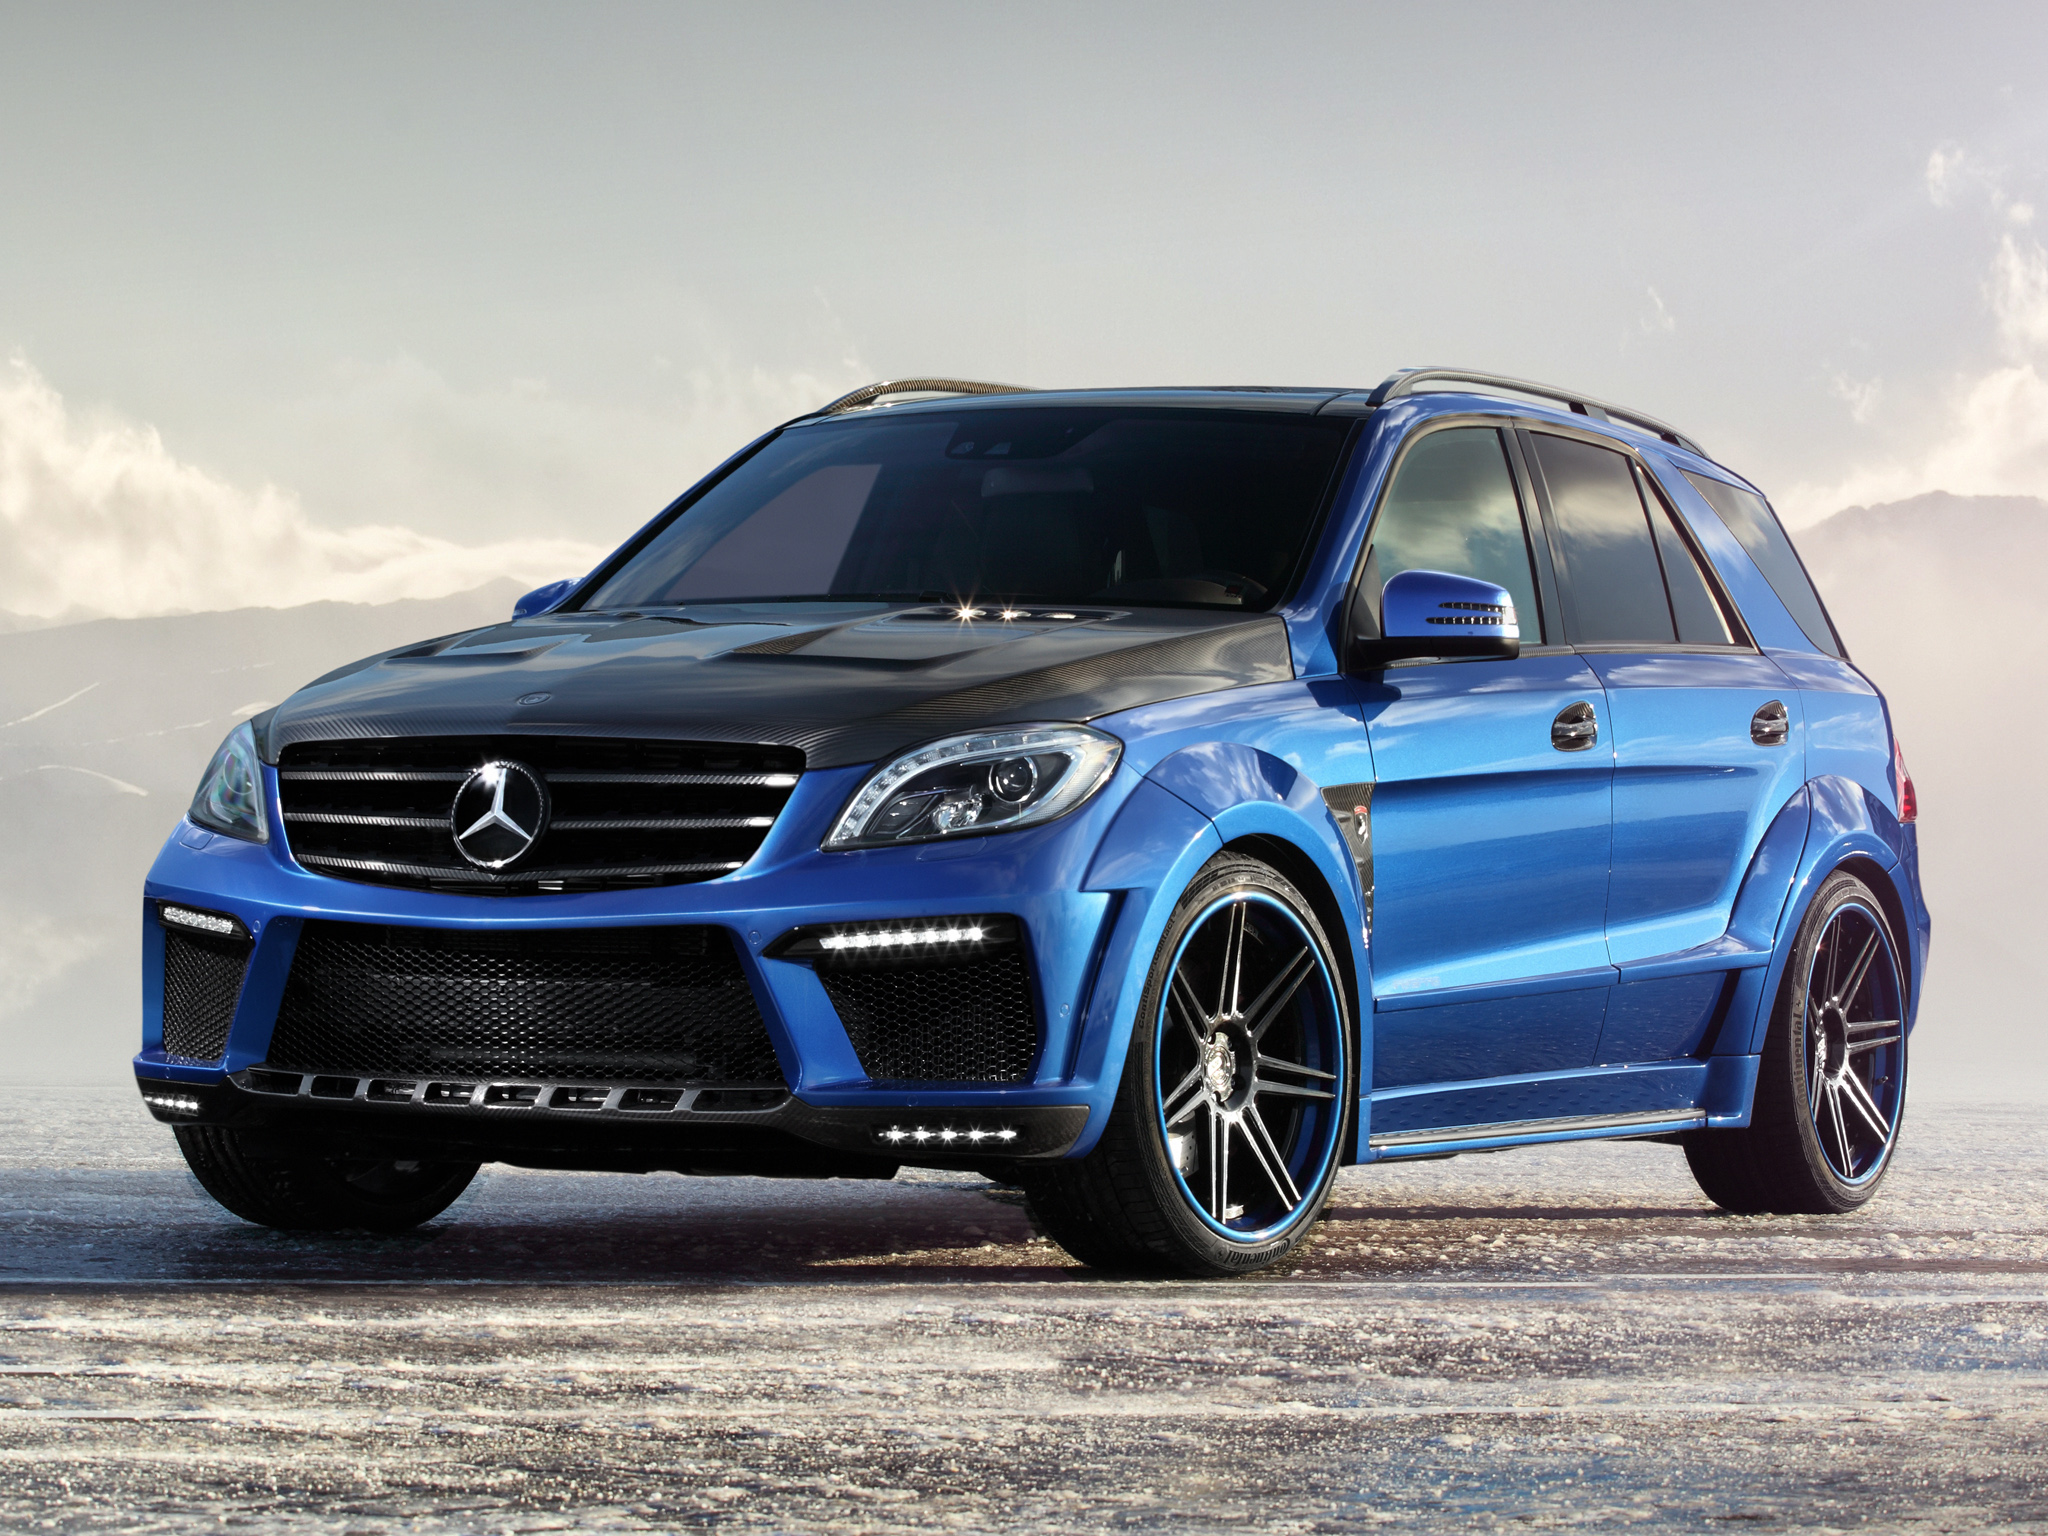 Mercedes benz suv wallpaper in blue for Blue mercedes benz